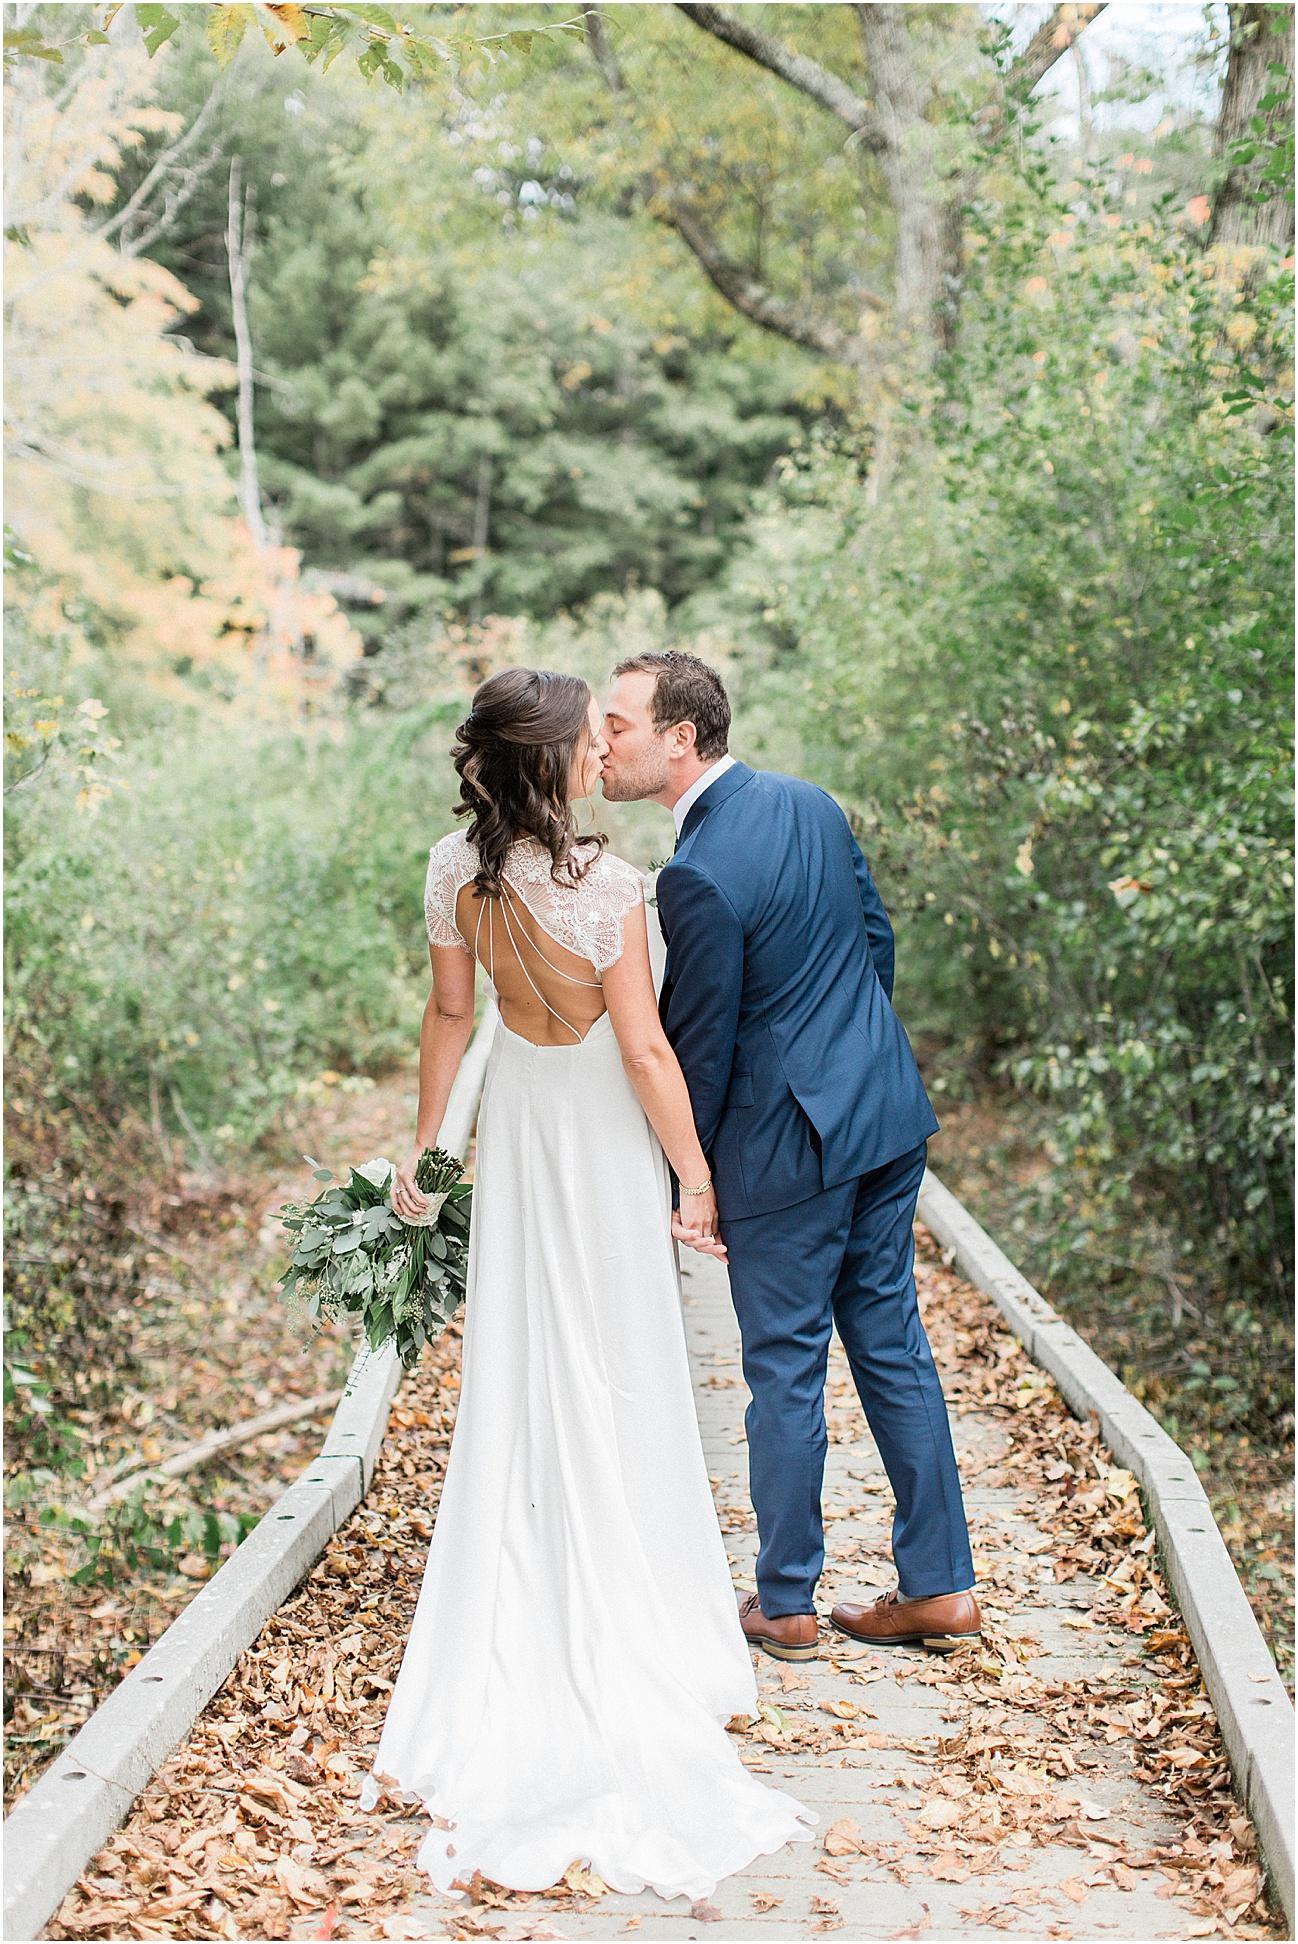 jenna_mike_willowdale_estate_topsfield_neutral_whites_greens_fall_cape_cod_boston_wedding_photographer_meredith_jane_photography_photo_1435.jpg